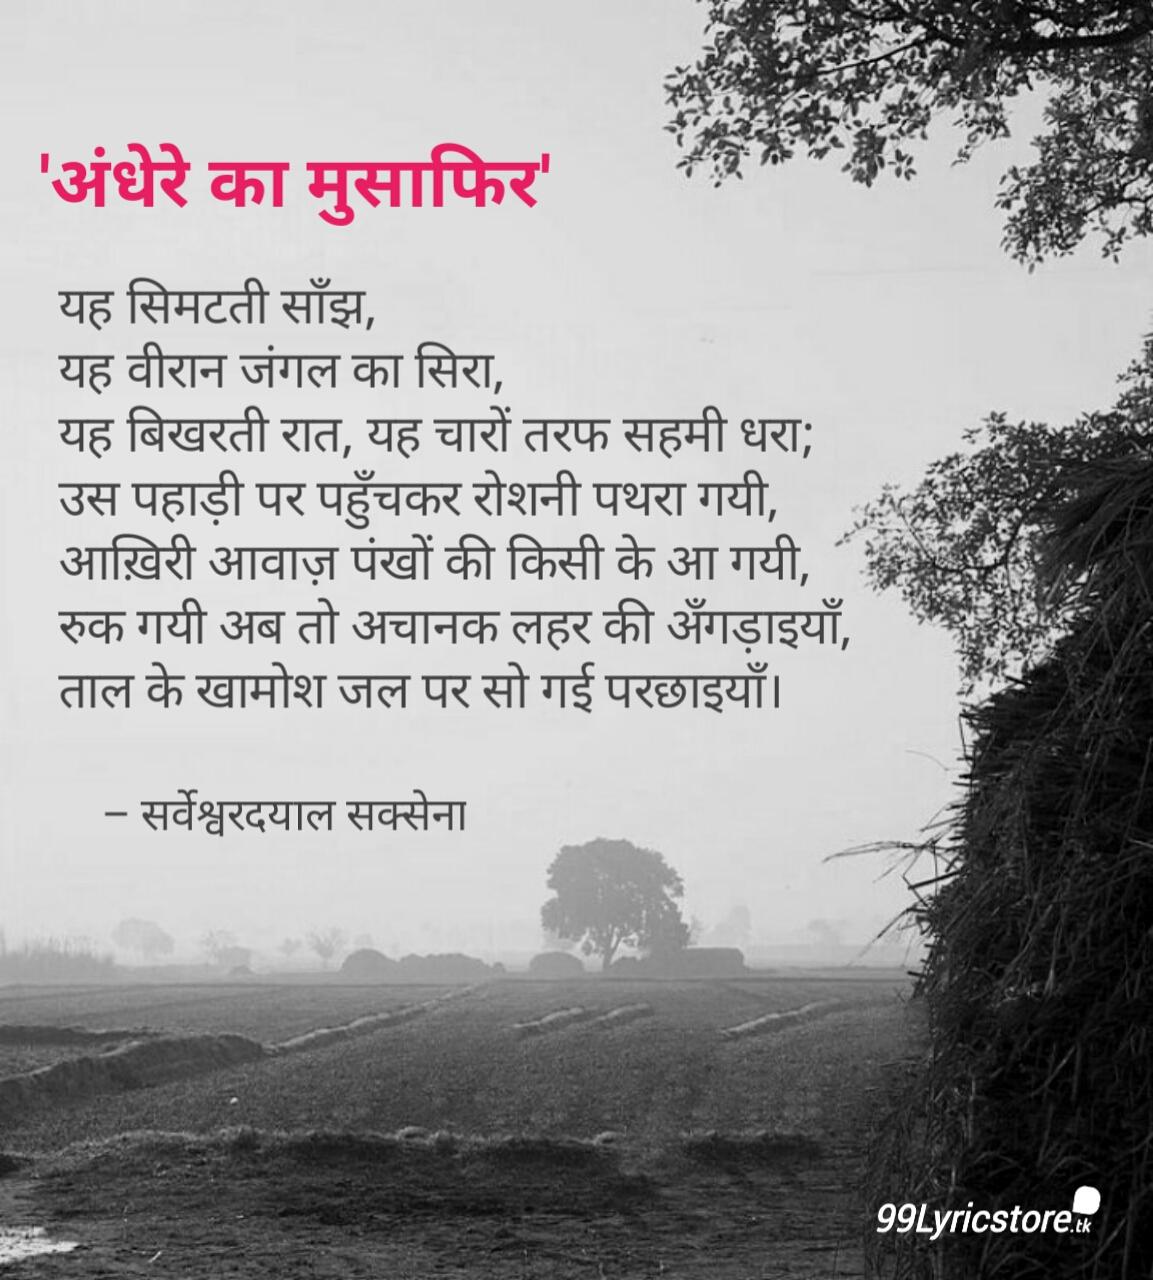 सर्वेश्वरदयाल सक्सेना, अँधेरे का मुसाफ़िर, हिन्दी कविता